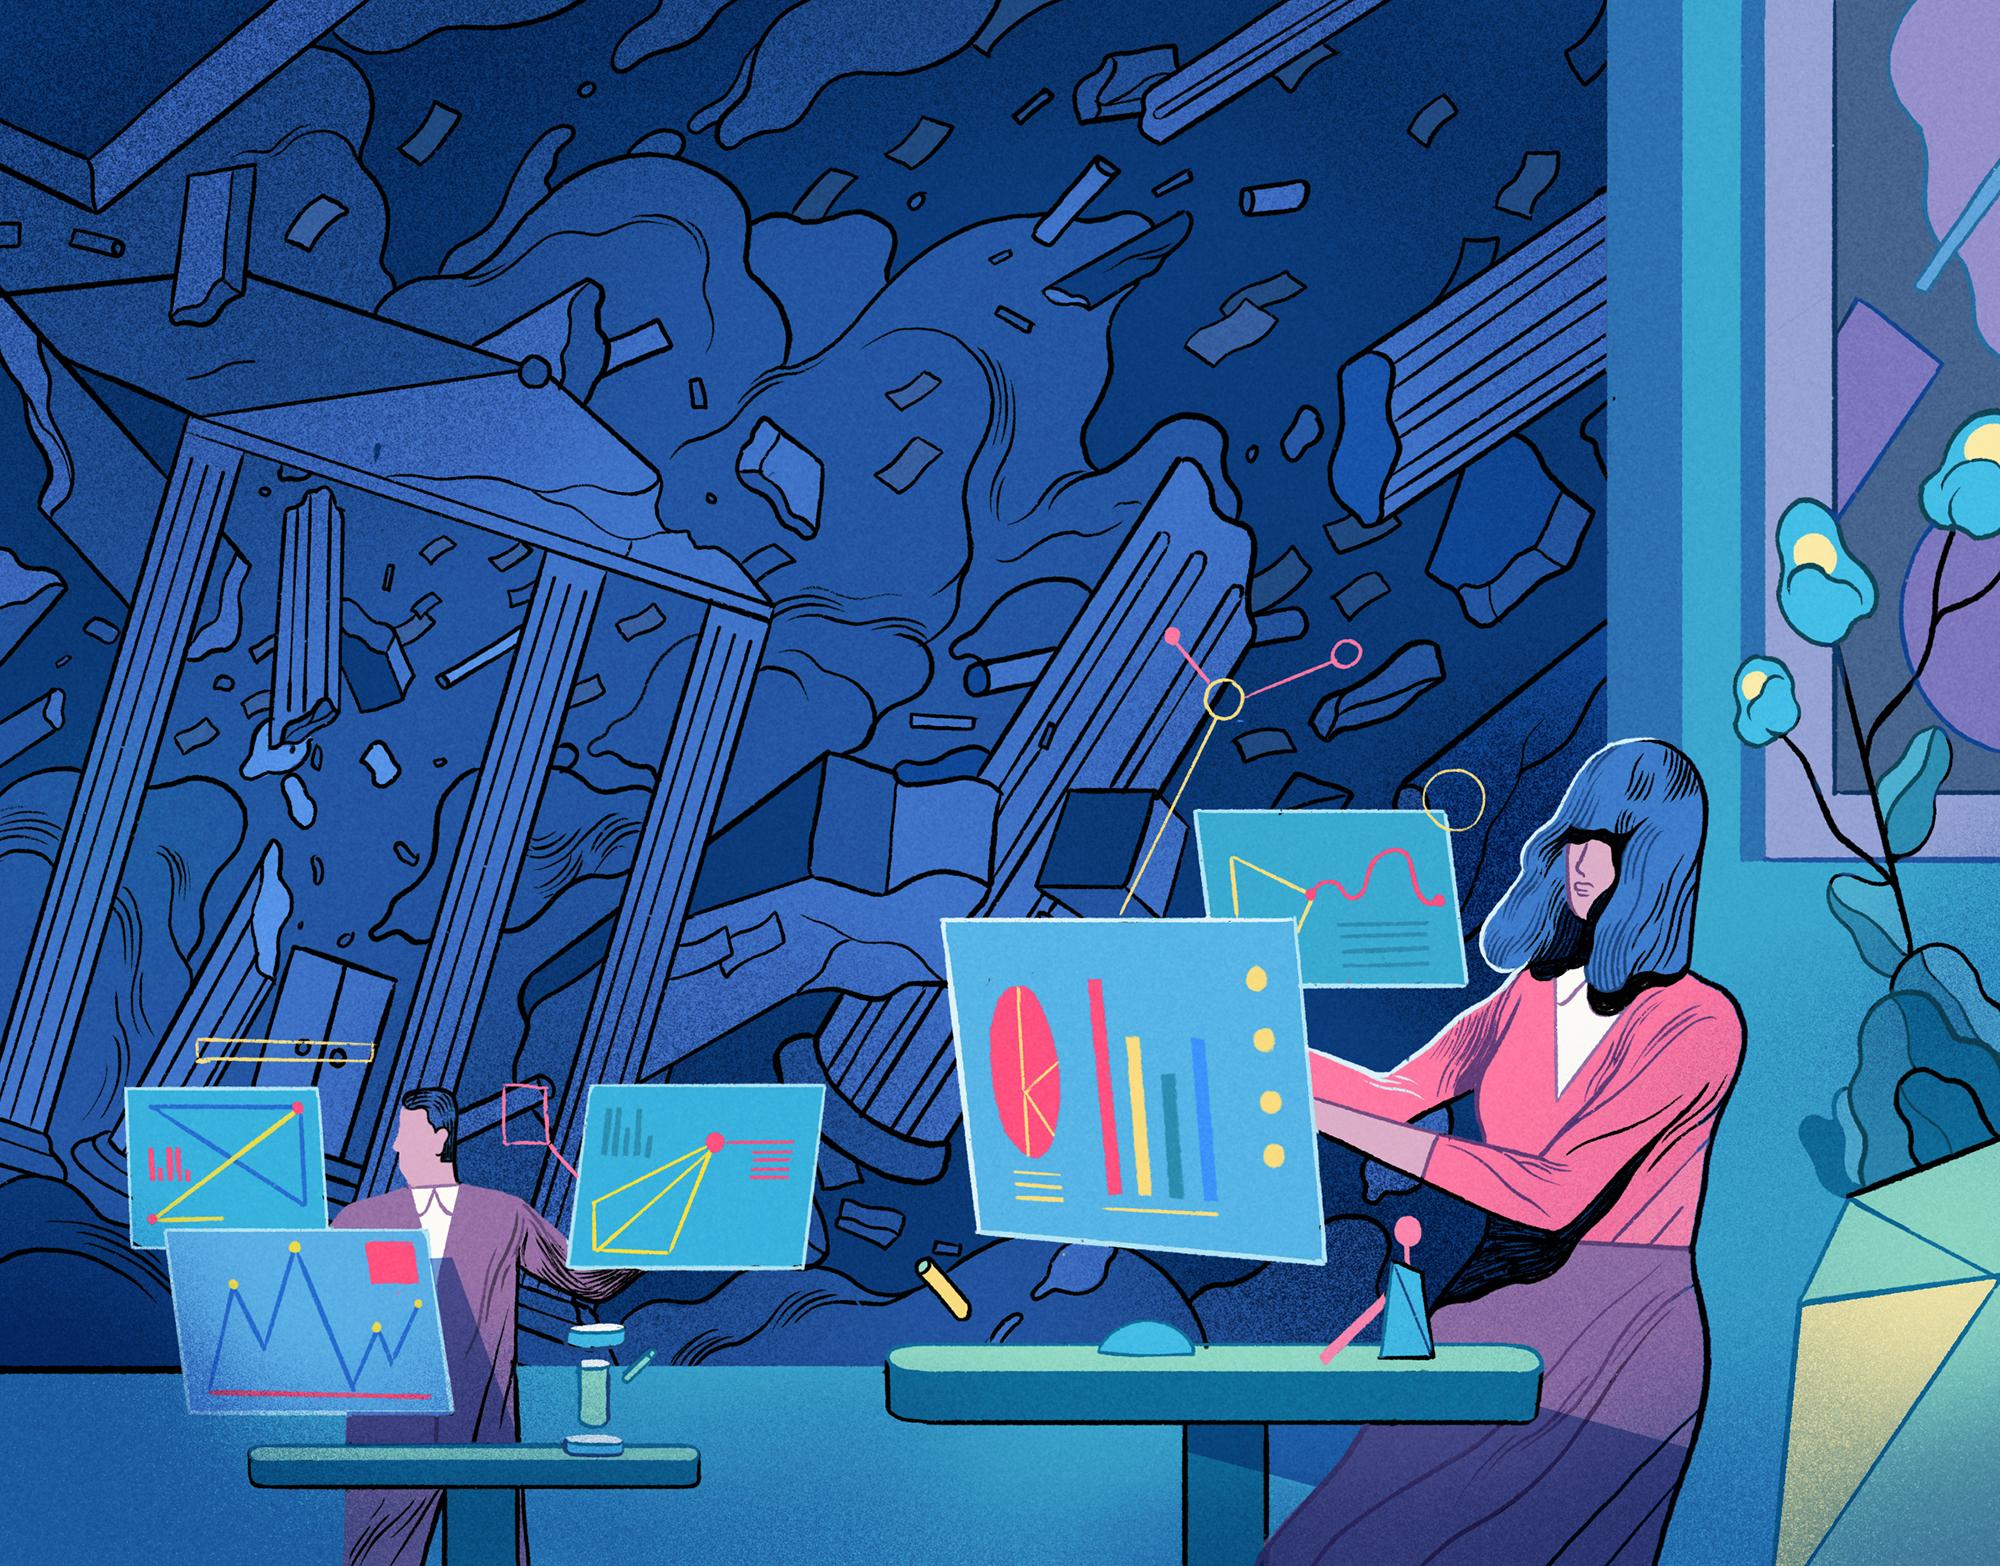 The WIRED World in 2018 by Rune Fisker | Agent Pekka